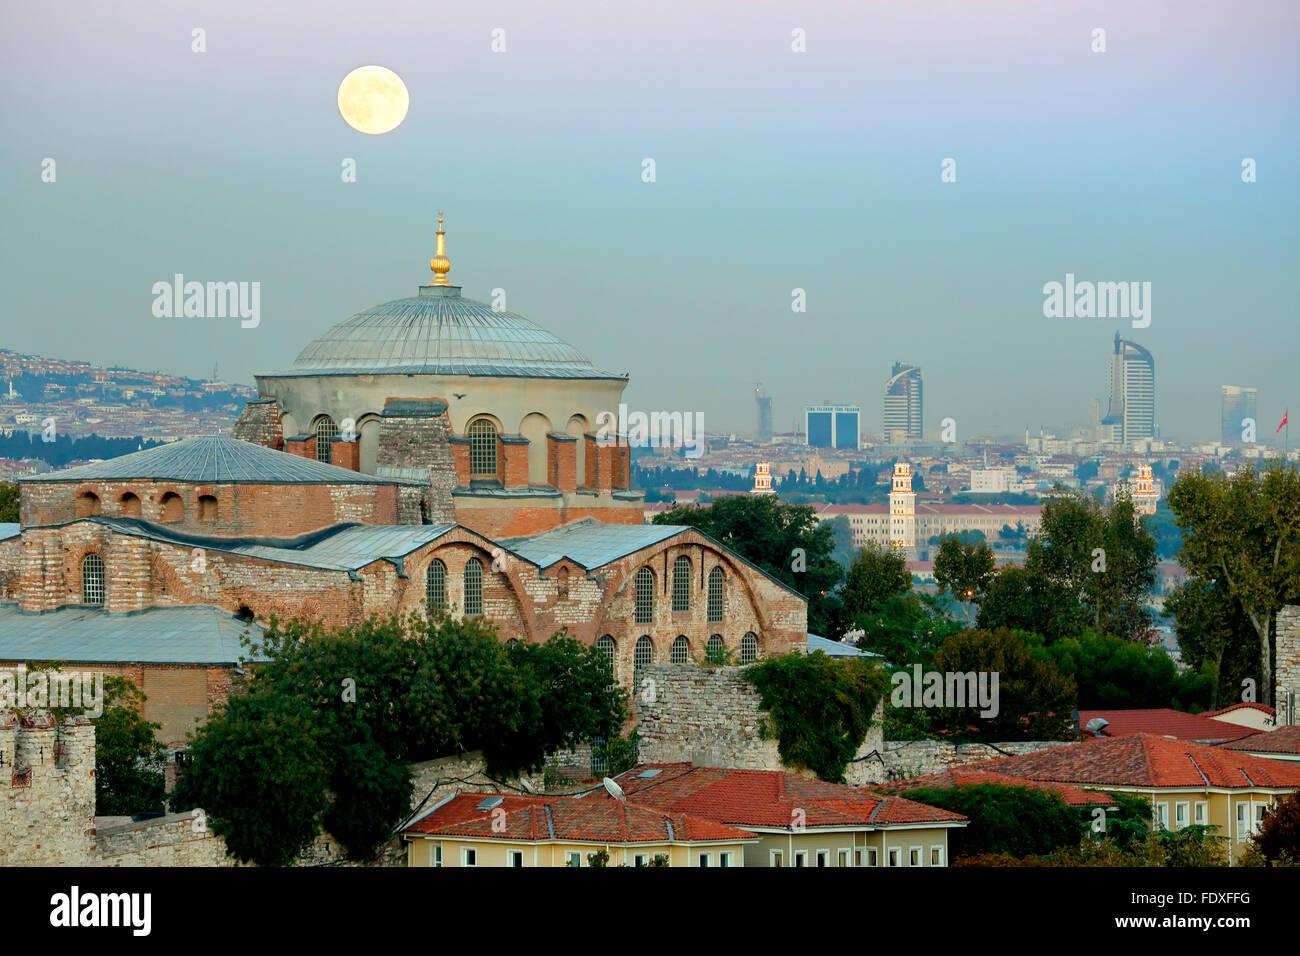 Moon over dome of Hagia Eirene Museum, Topkapi Palace, Istanbul, Turkey - Stock Image